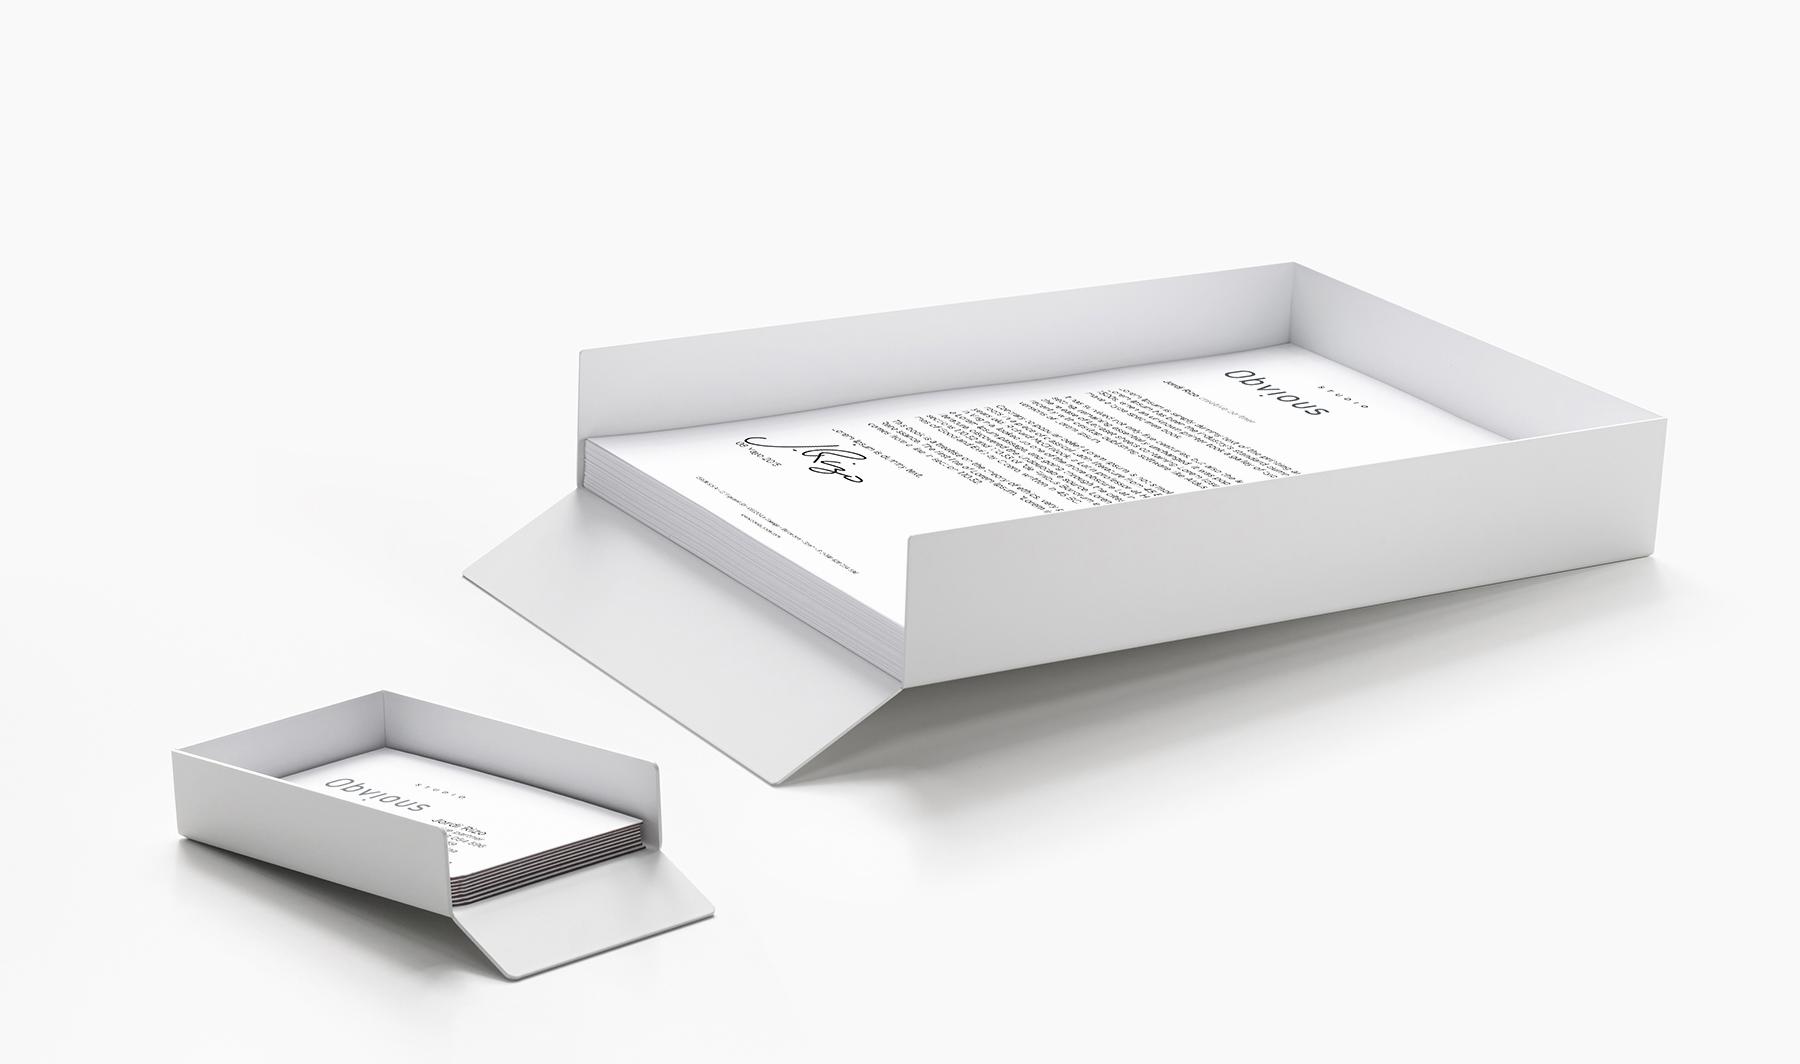 Desktop box   - O  bvious